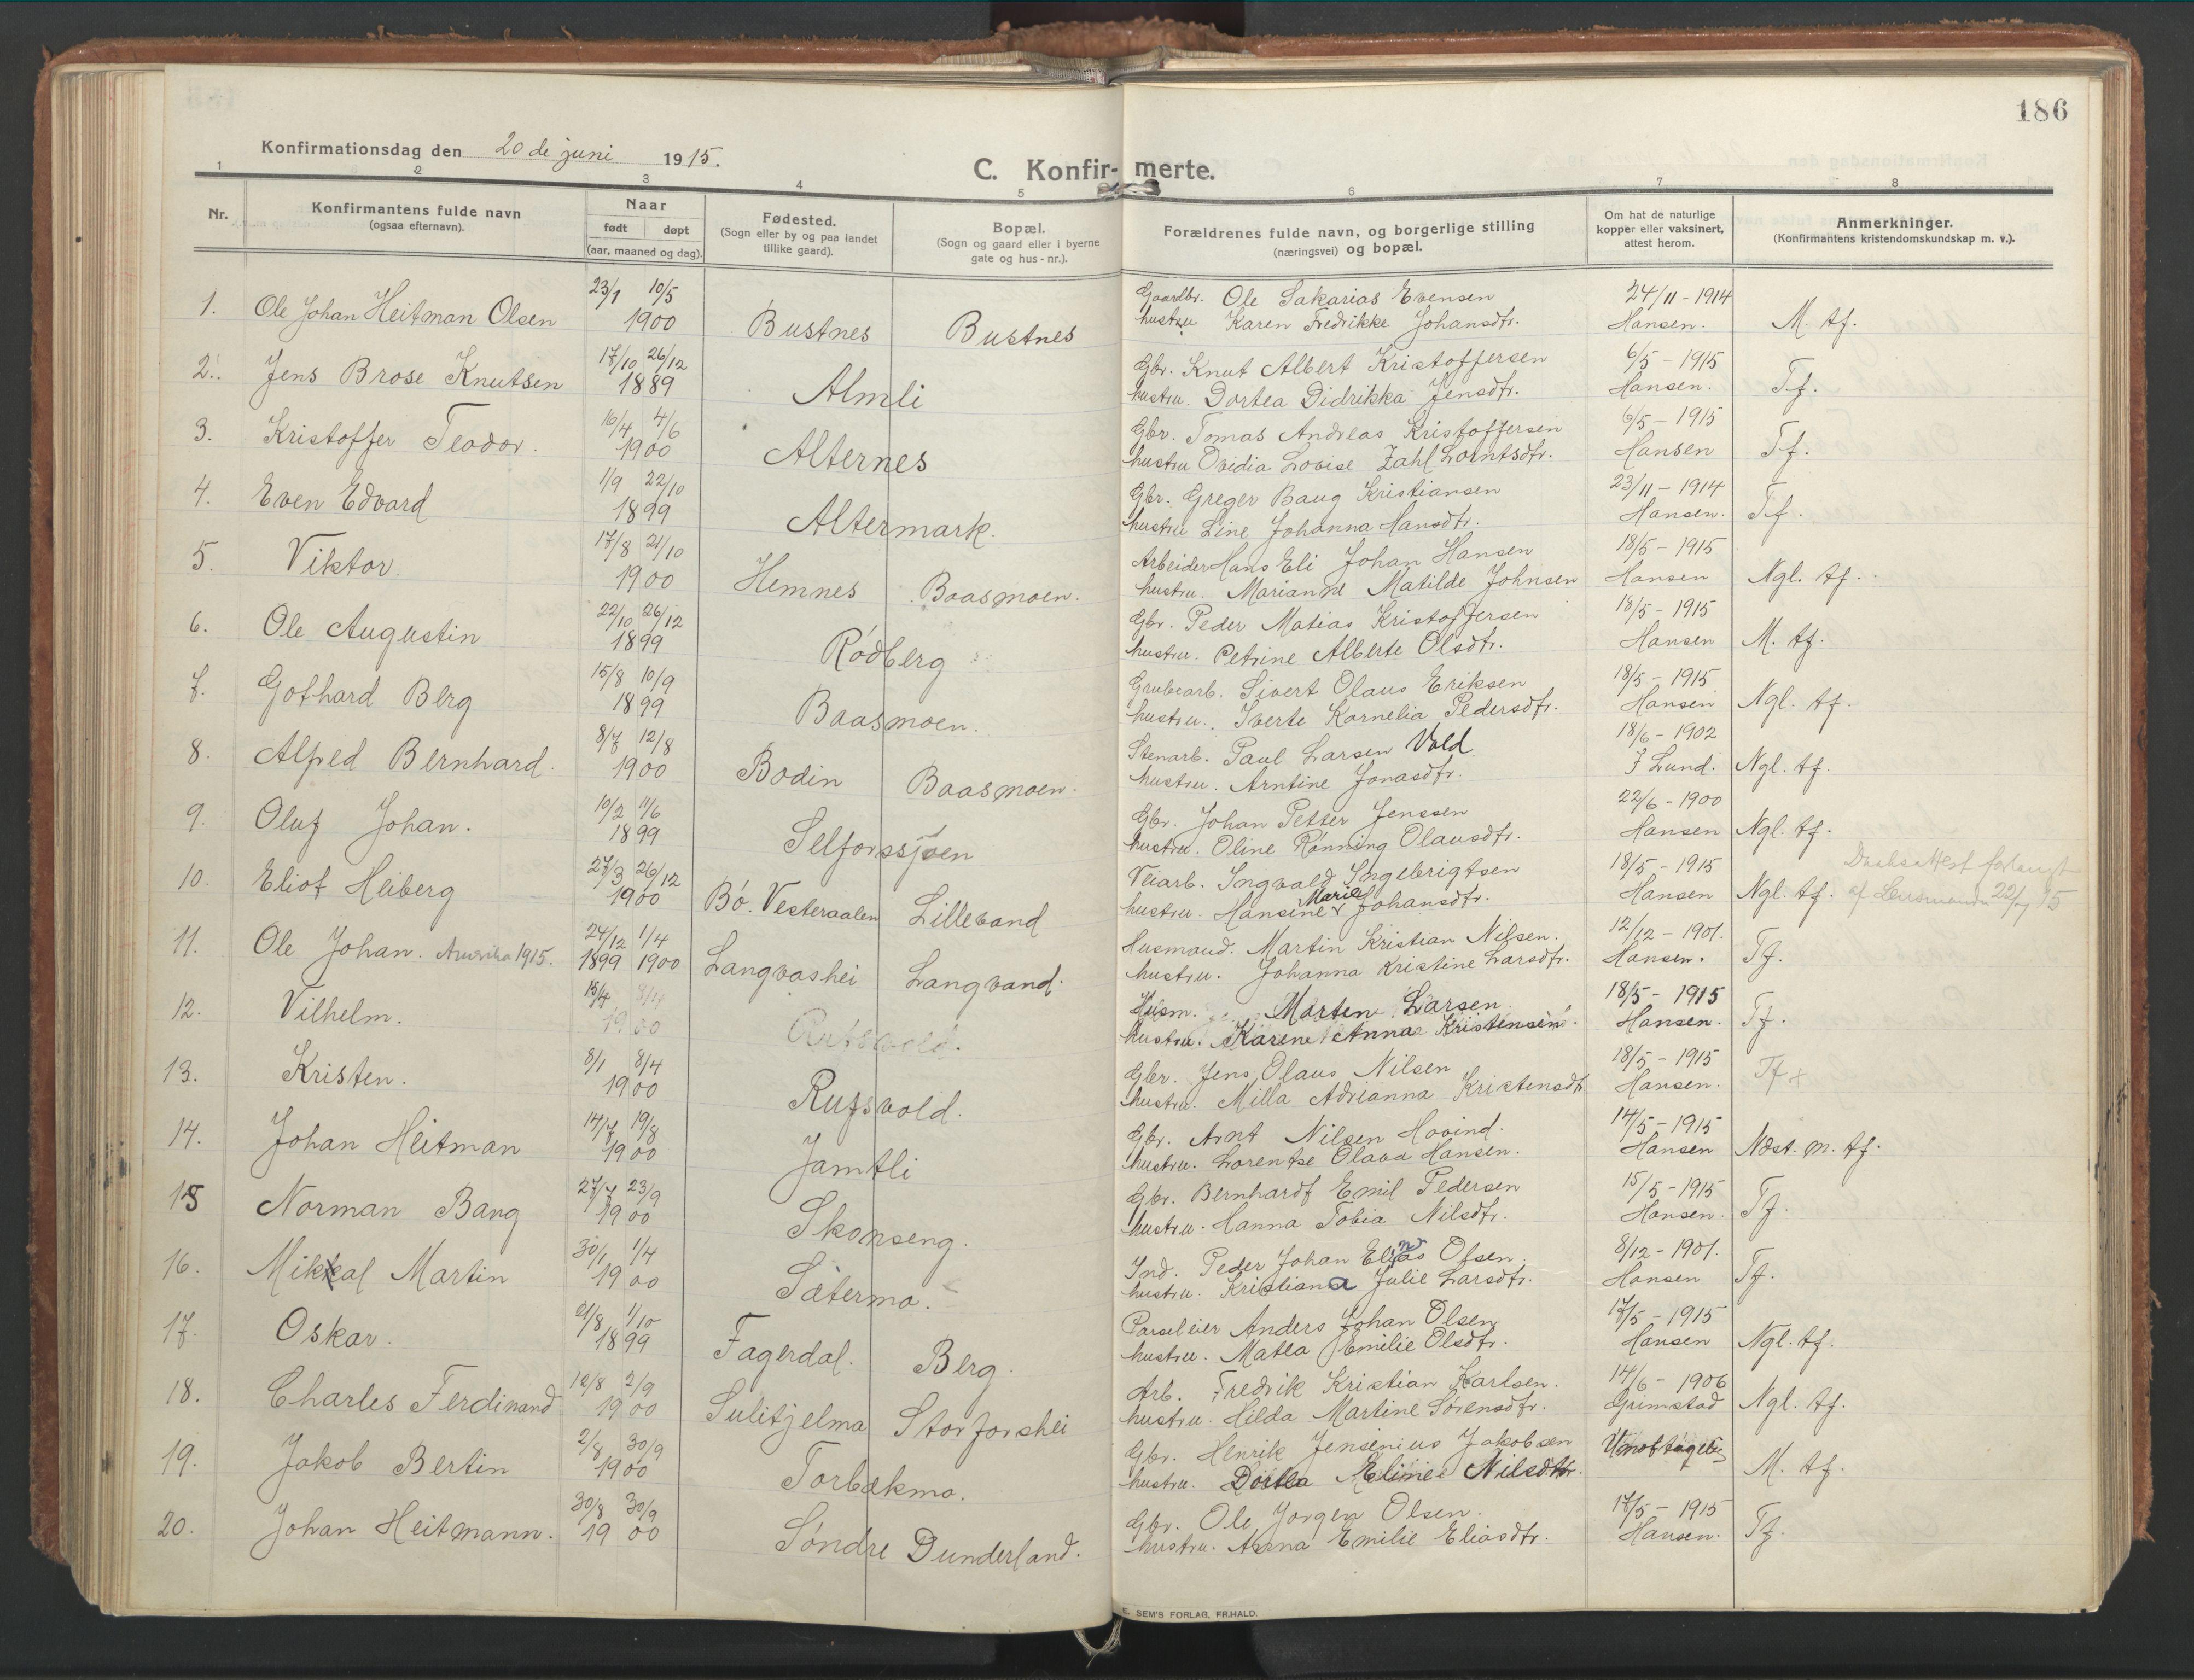 SAT, Ministerialprotokoller, klokkerbøker og fødselsregistre - Nordland, 827/L0404: Ministerialbok nr. 827A16, 1912-1925, s. 186